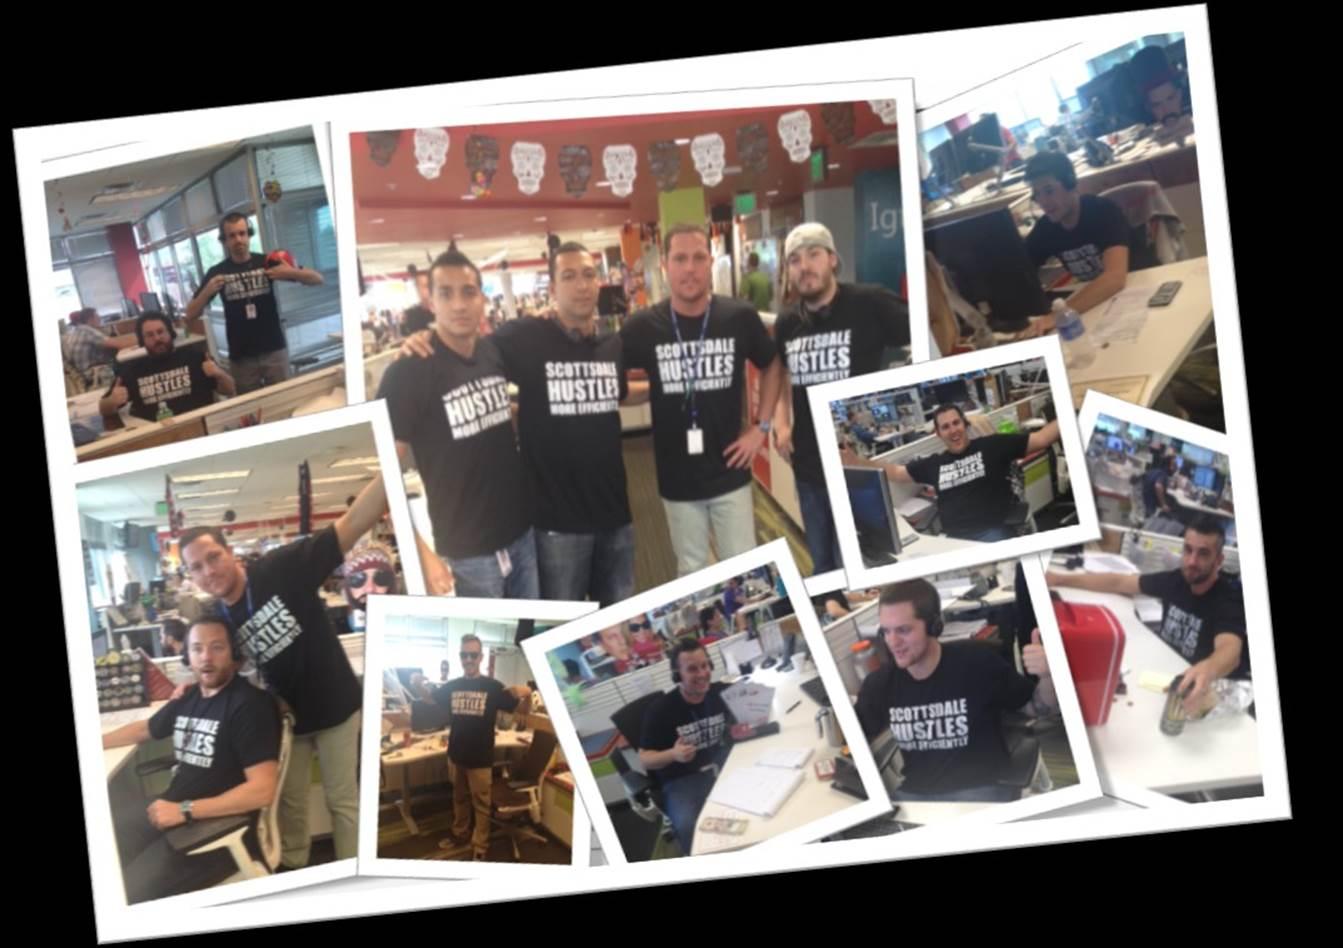 Custom T Shirts For Scottsdale Wio Region Shirt Design Ideas